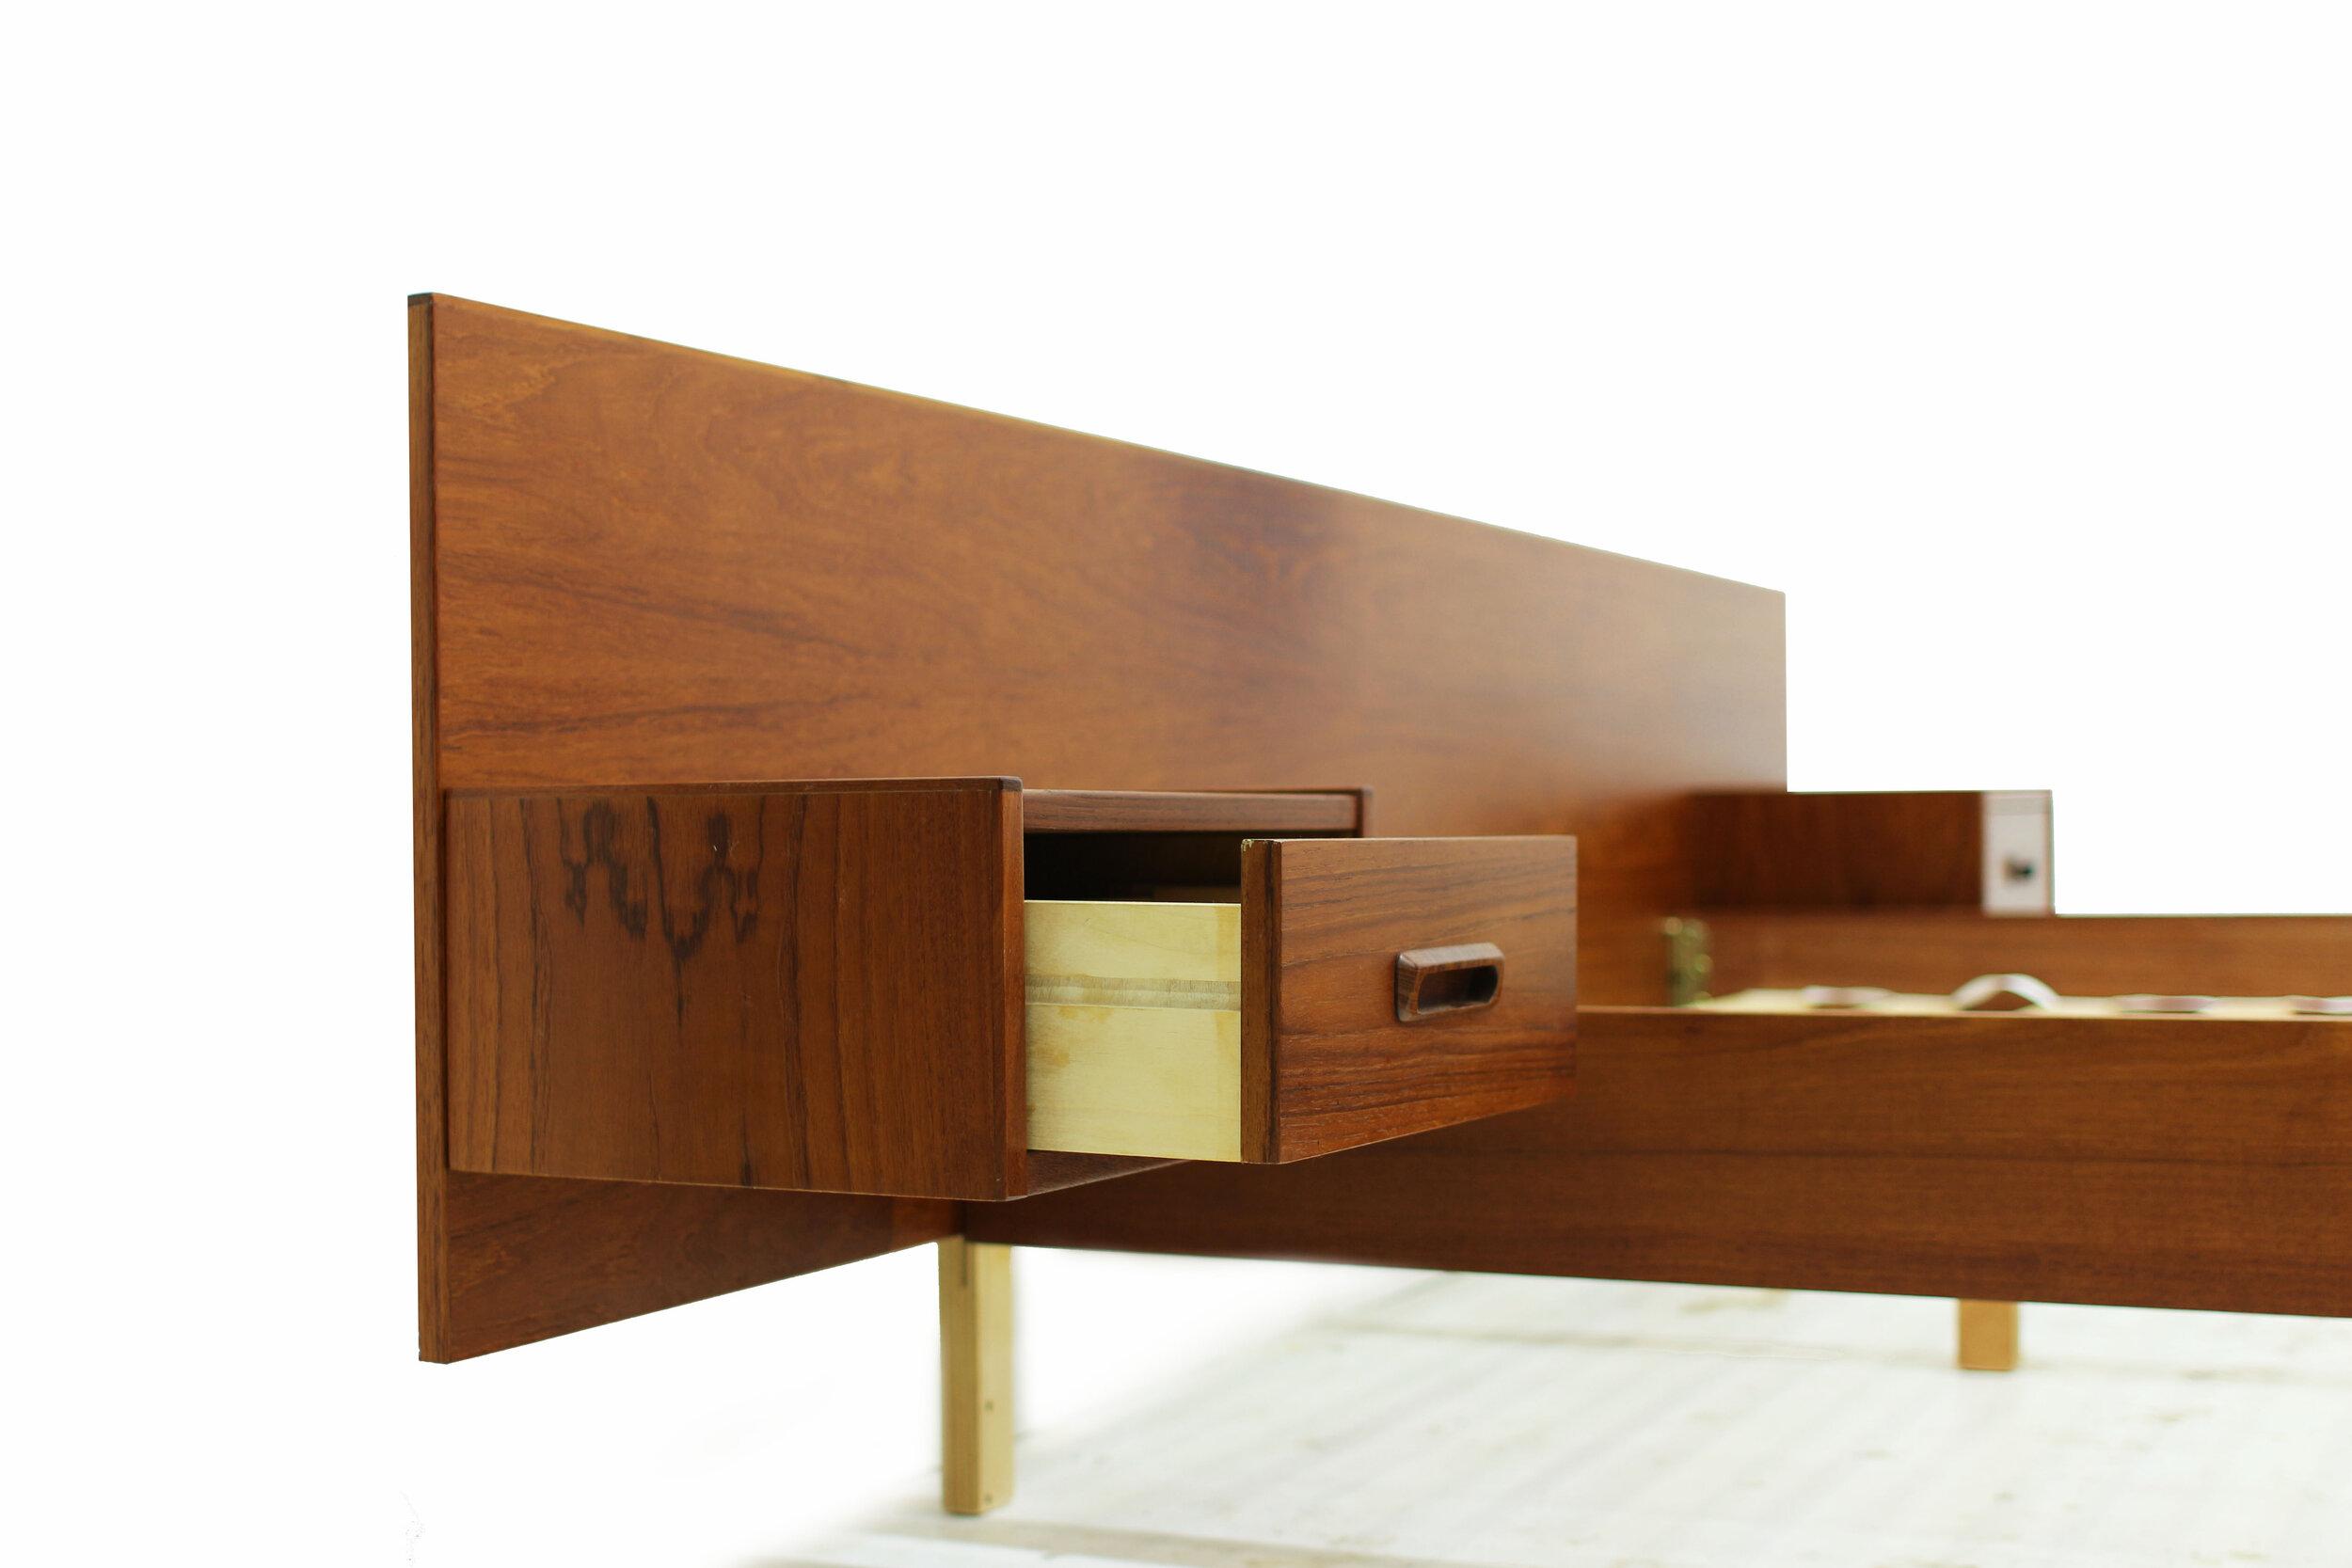 Mid Century Teak Double Platform Bed with Attached Nightstands (1).jpg